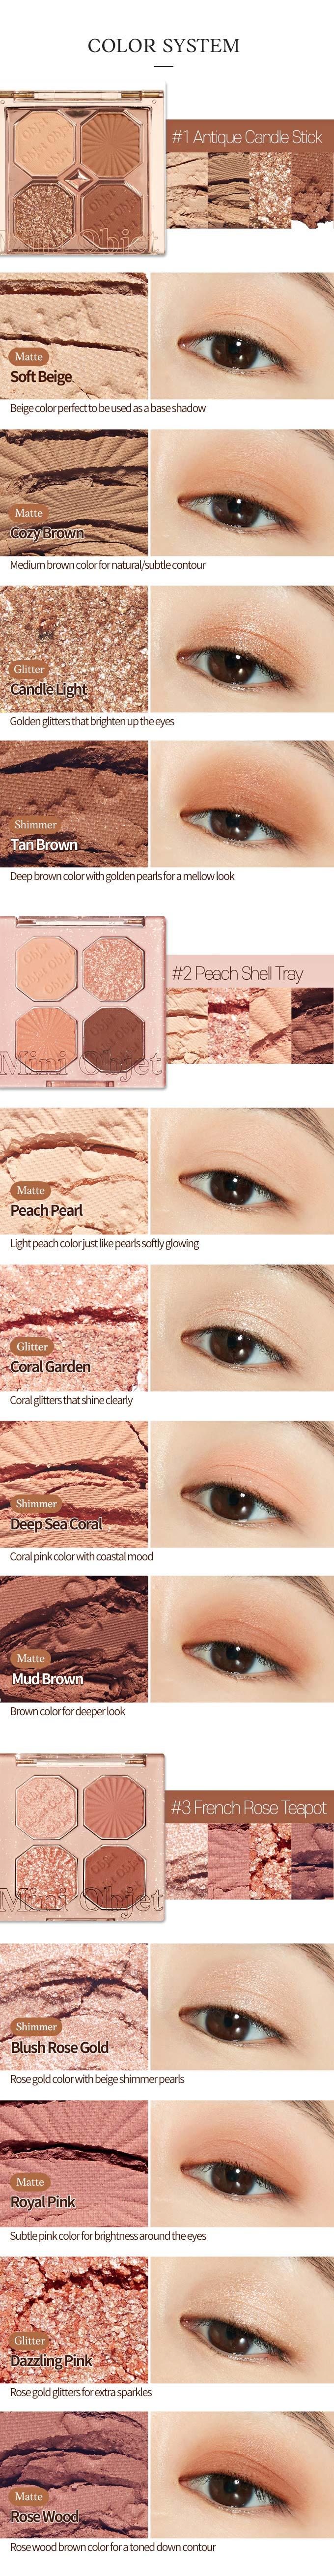 20210308-play-color-eyes-mini-objet-des-03.jpg